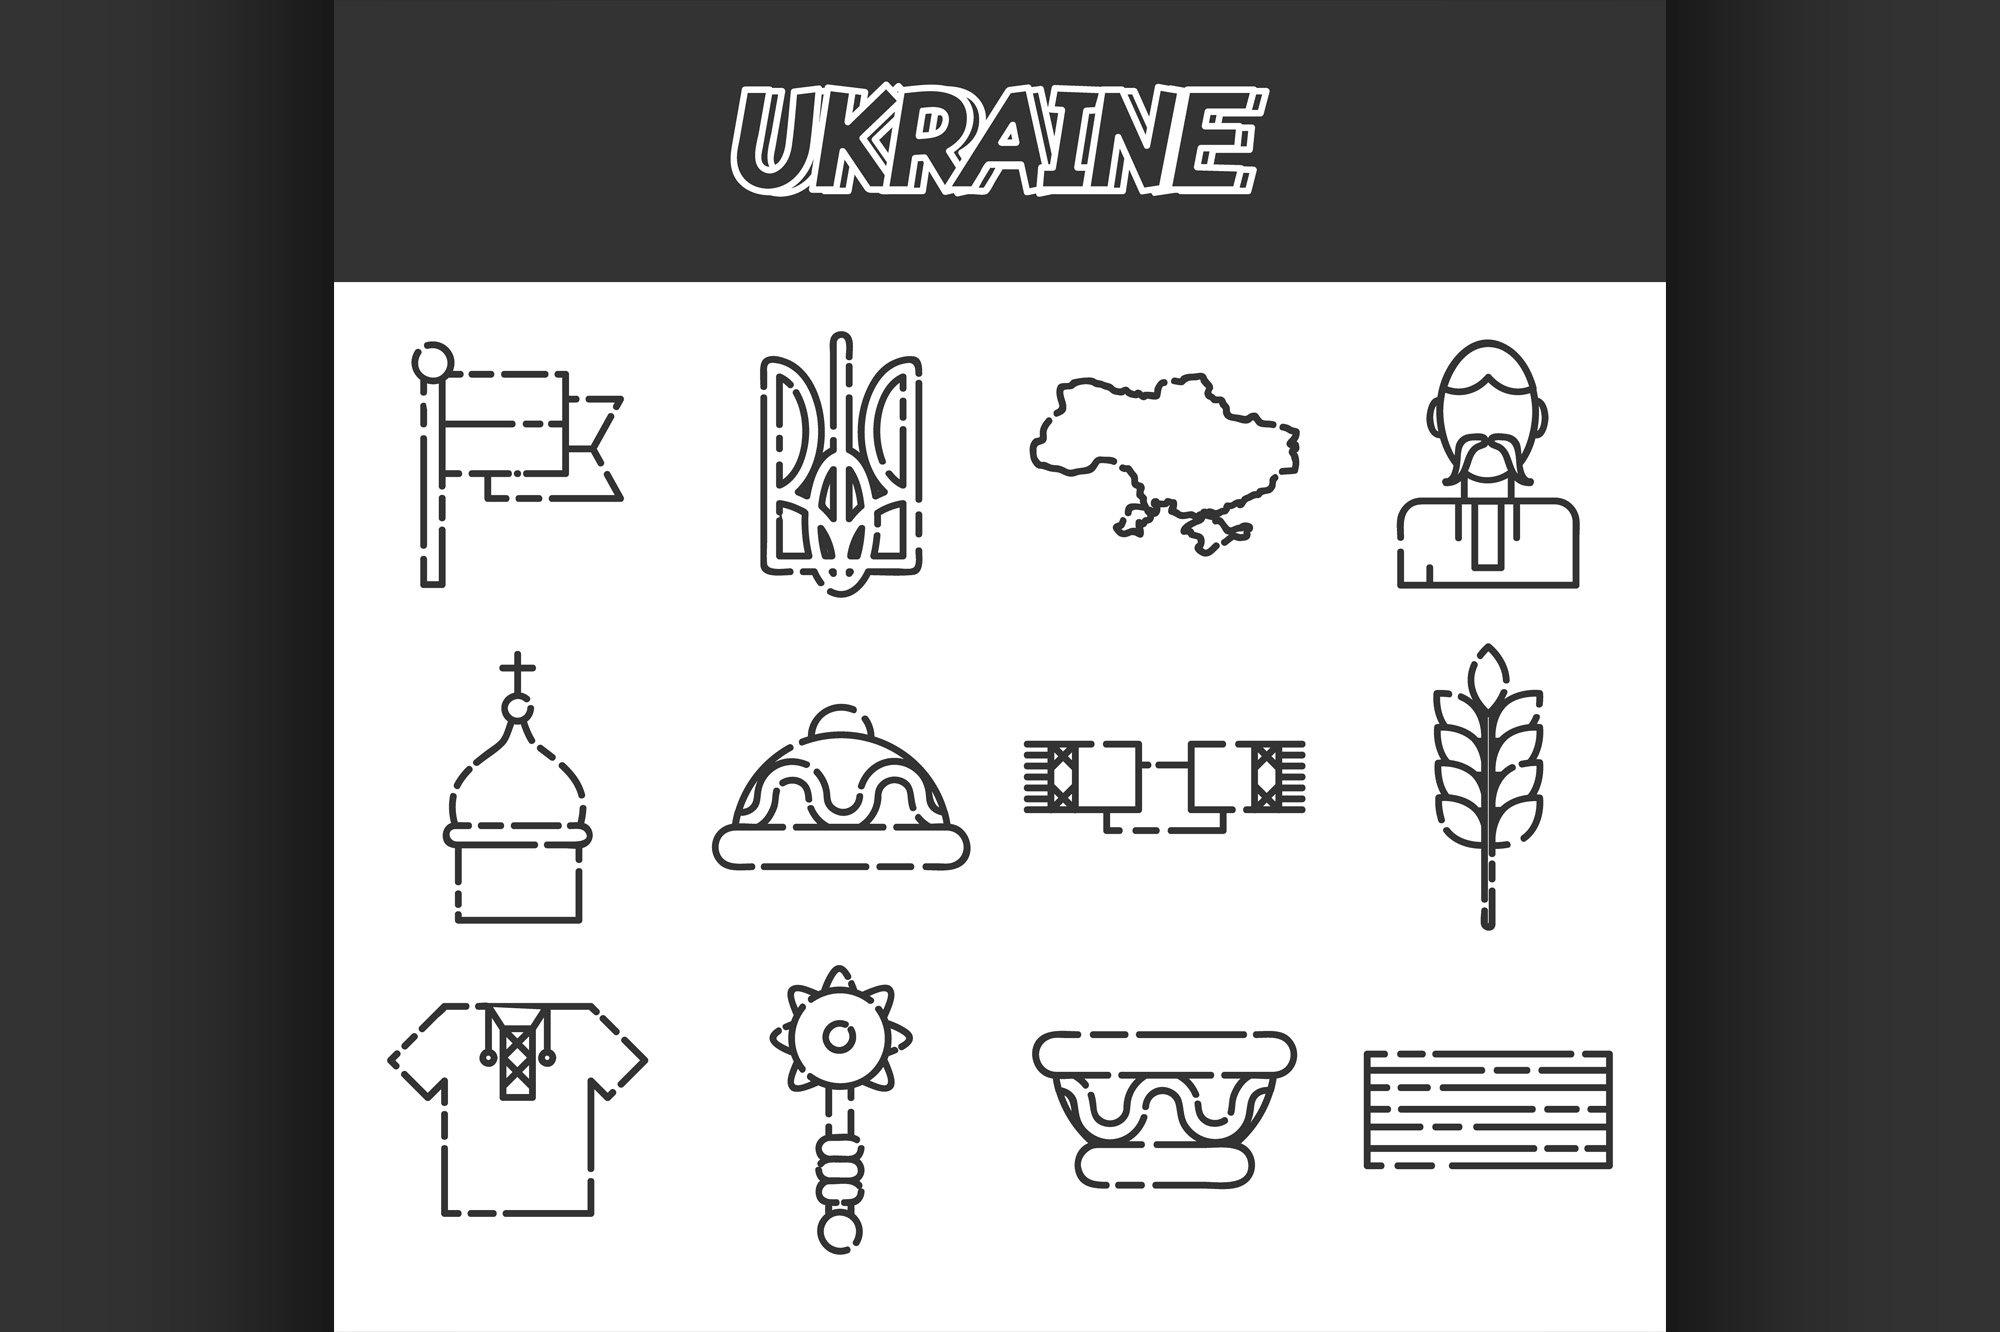 Ukraine icons set example image 1